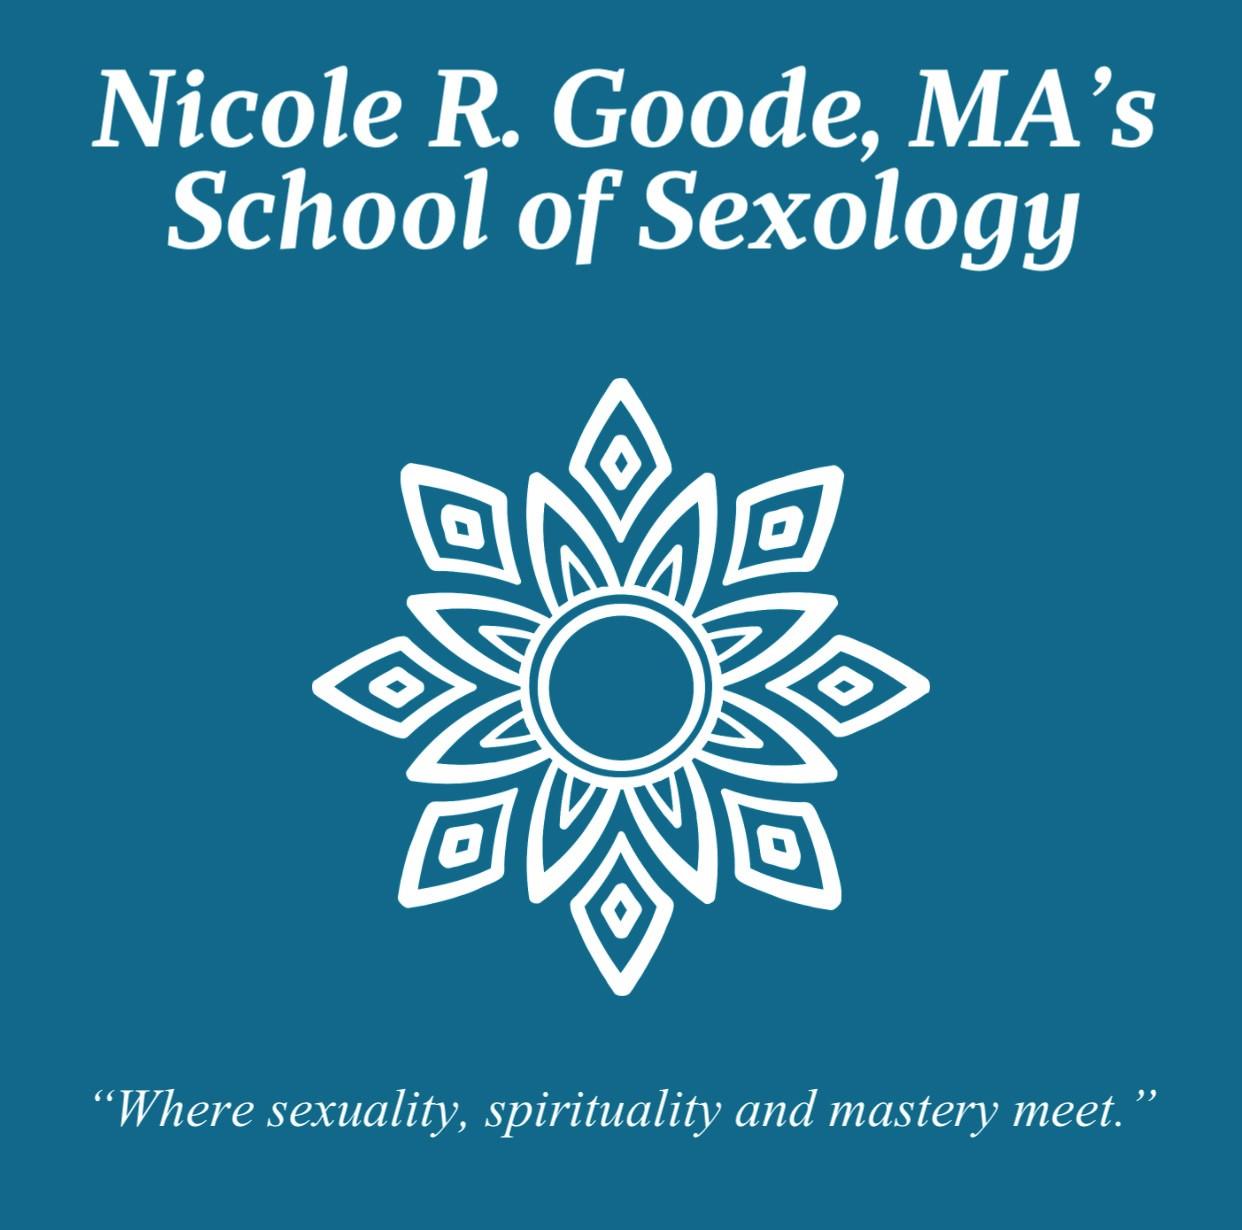 Nicole R. Goode, M.A.'s School of Sexology